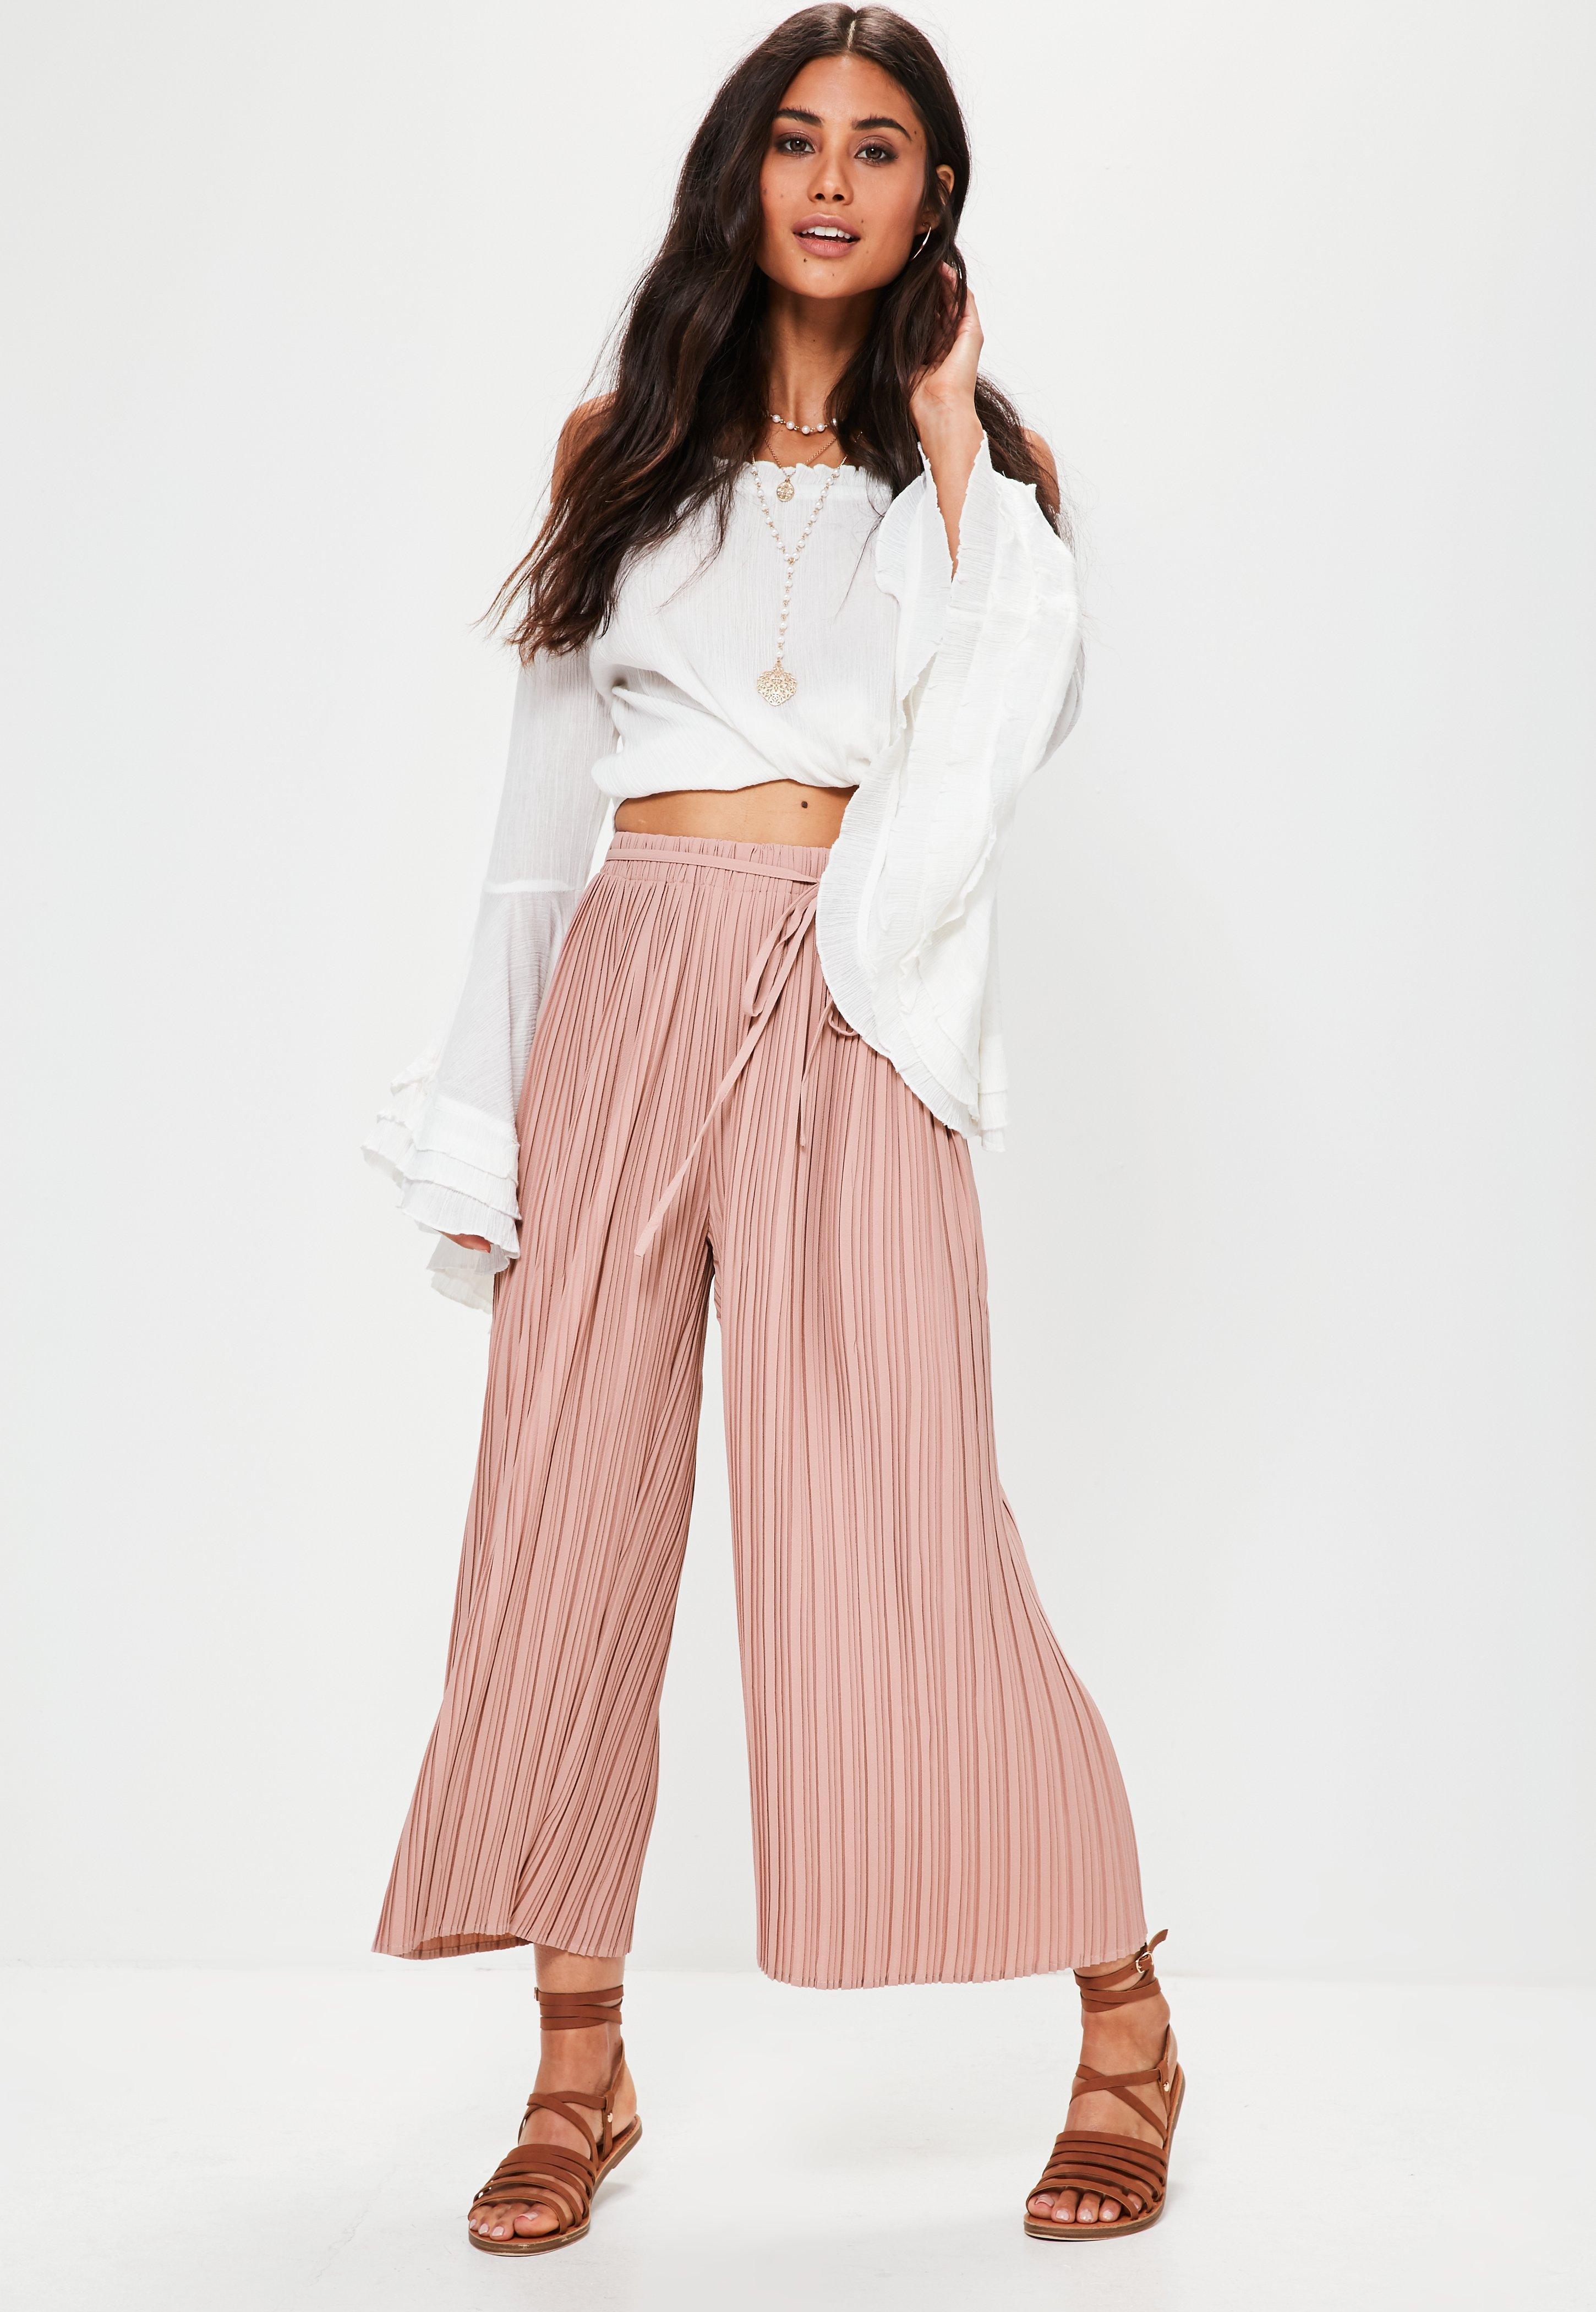 Pantalones para mujer | Palazzo, cortos, vaqueros... - Missguided